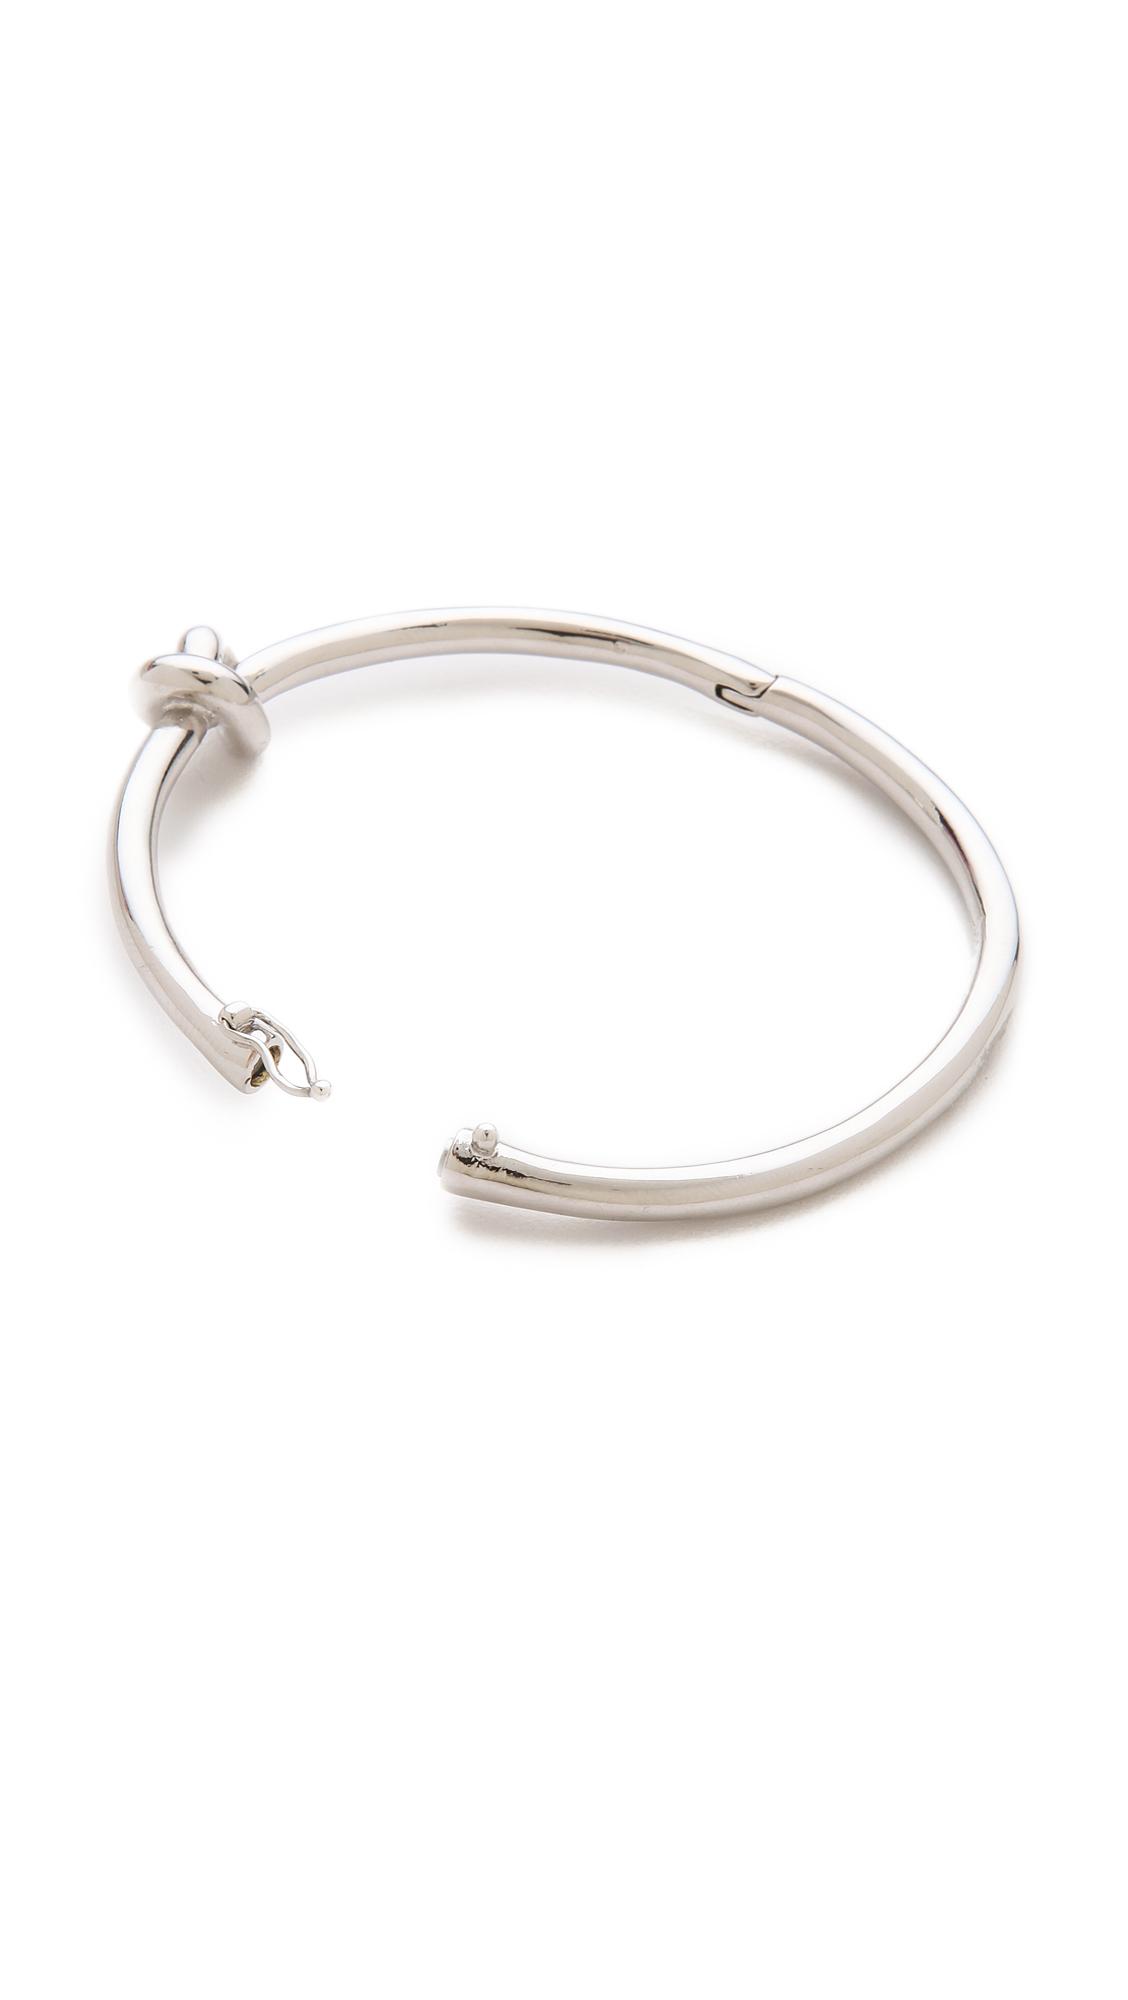 72462c7ff15e8 kate spade new york Metallic Sailor's Knot Bangle Bracelet